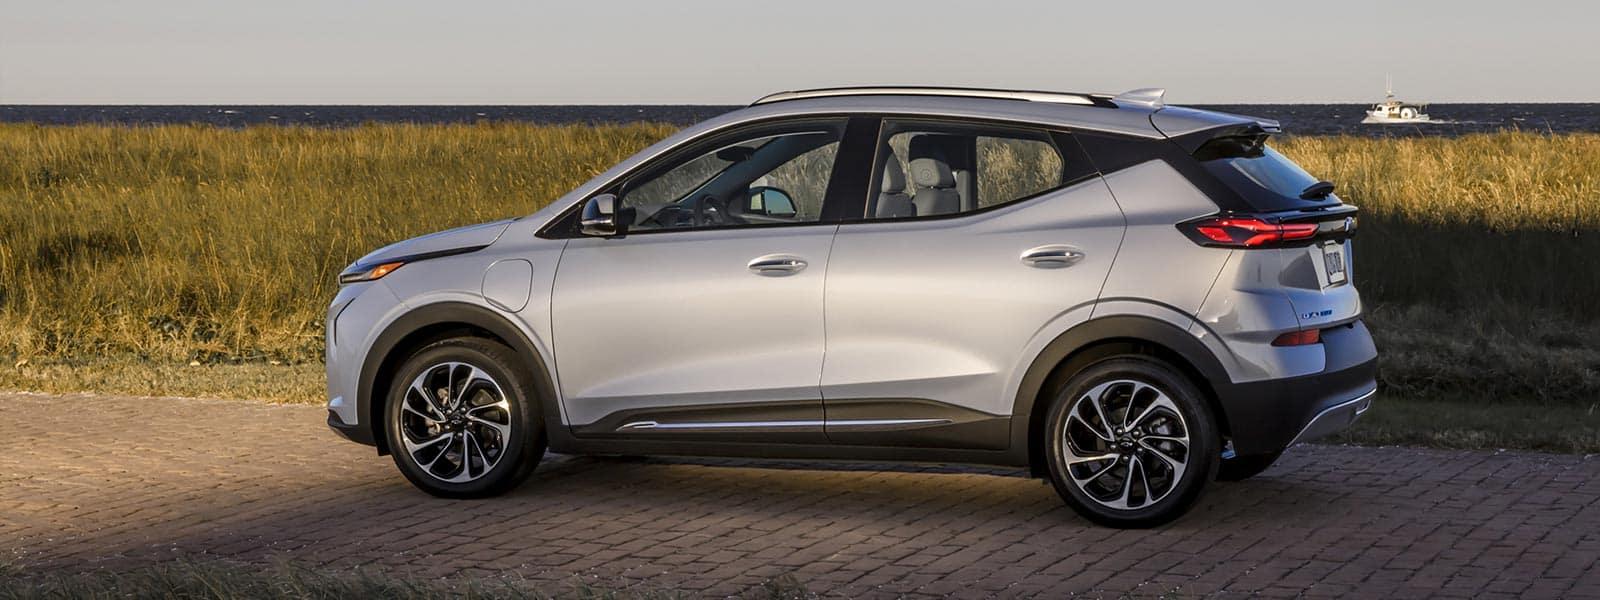 Lease or finance new 2022 Chevrolet Bolt EUV in Regina Saskatchewan